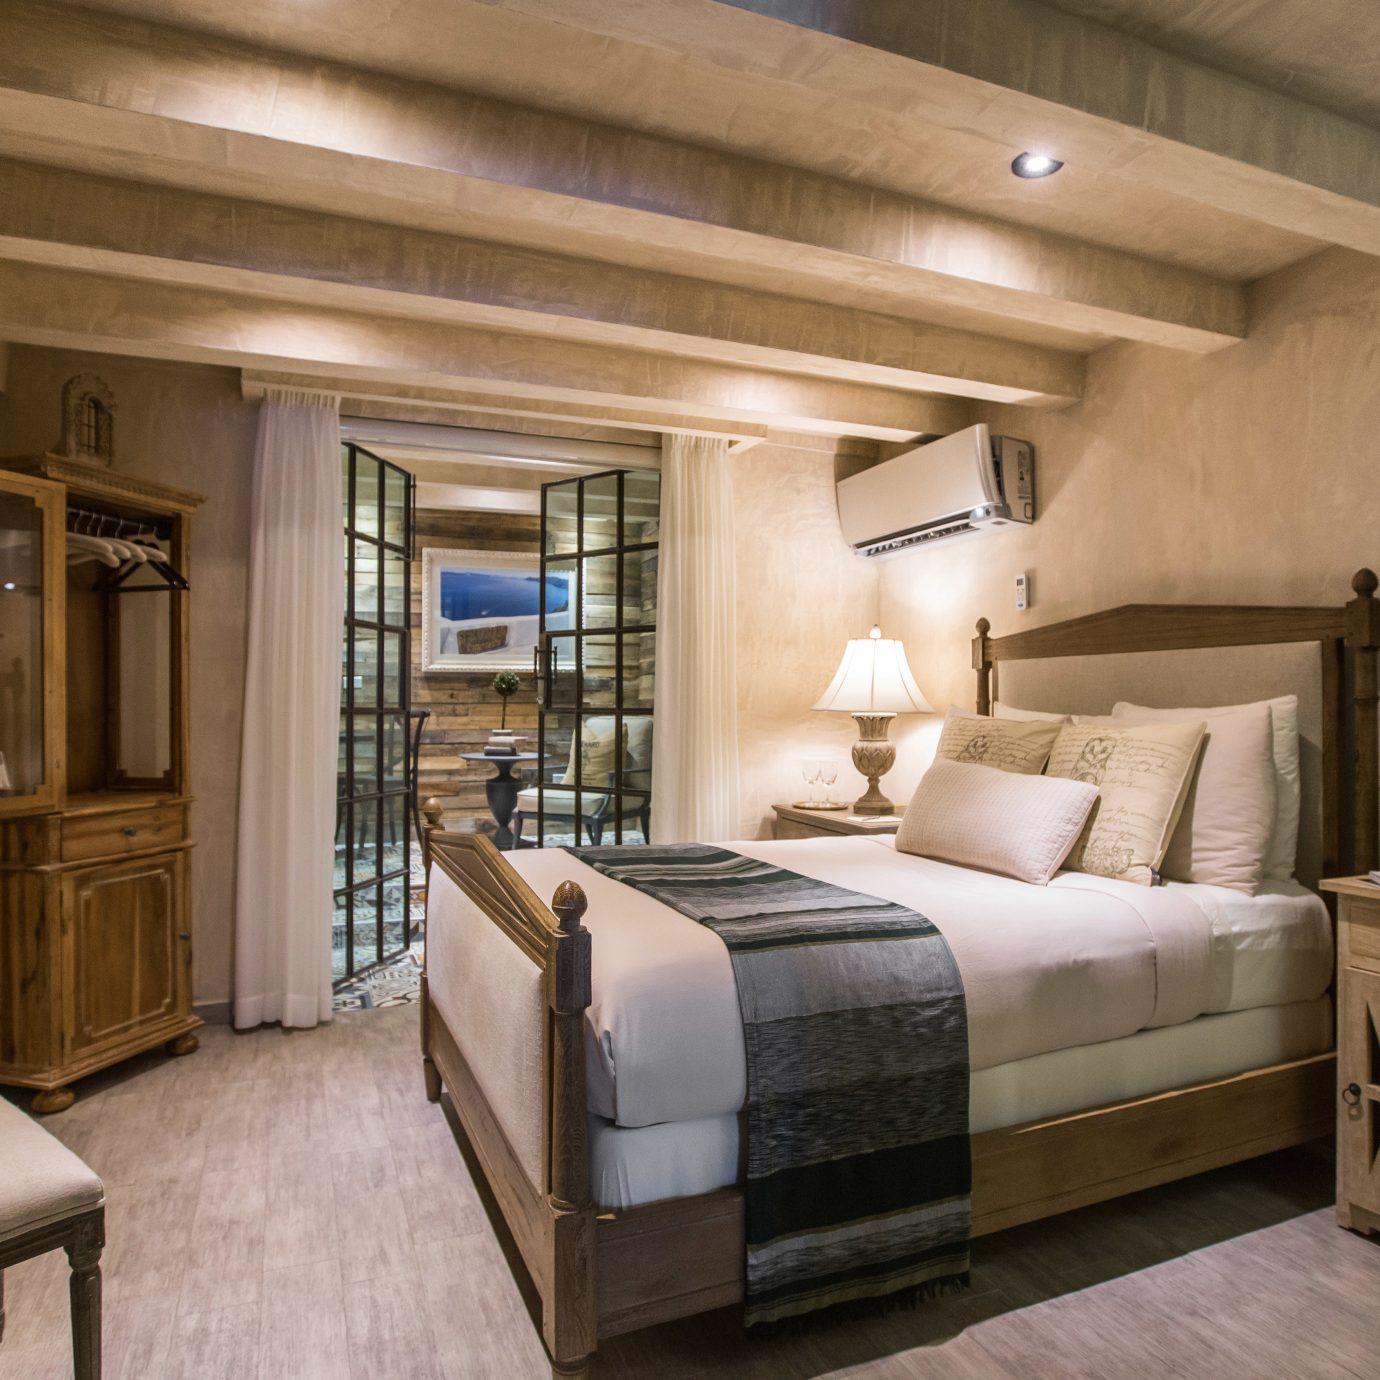 Bedroom Suite property home living room cottage vehicle mansion tan